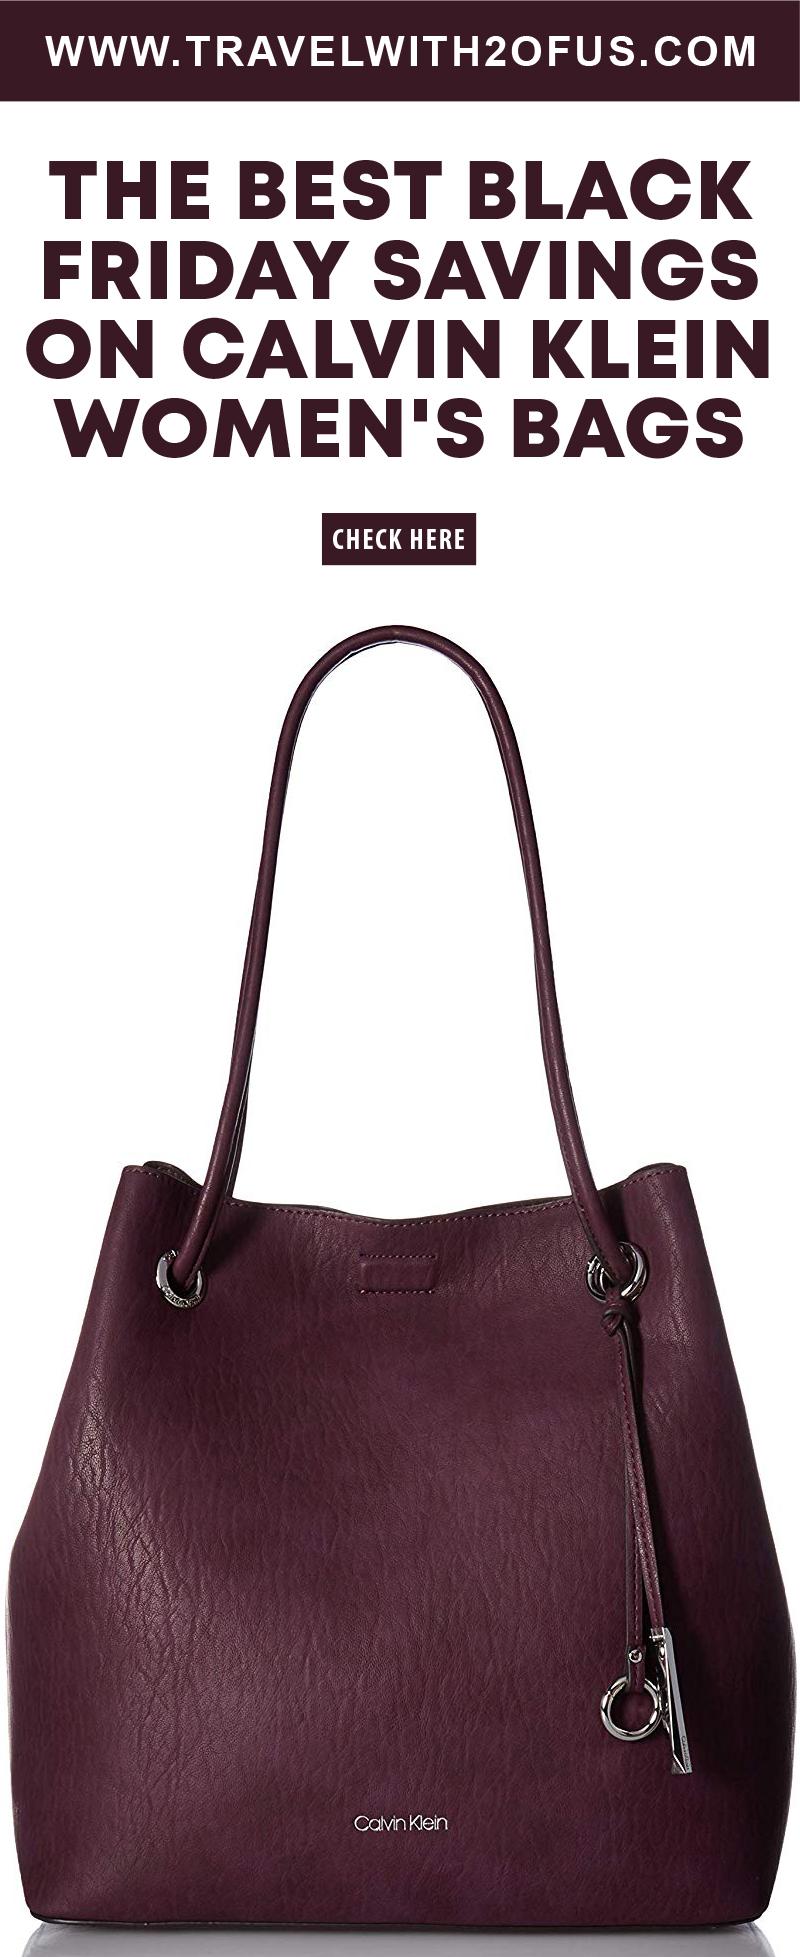 The Best Black Friday Savings On Calvin Klein Women s Bags 9ab36beb68